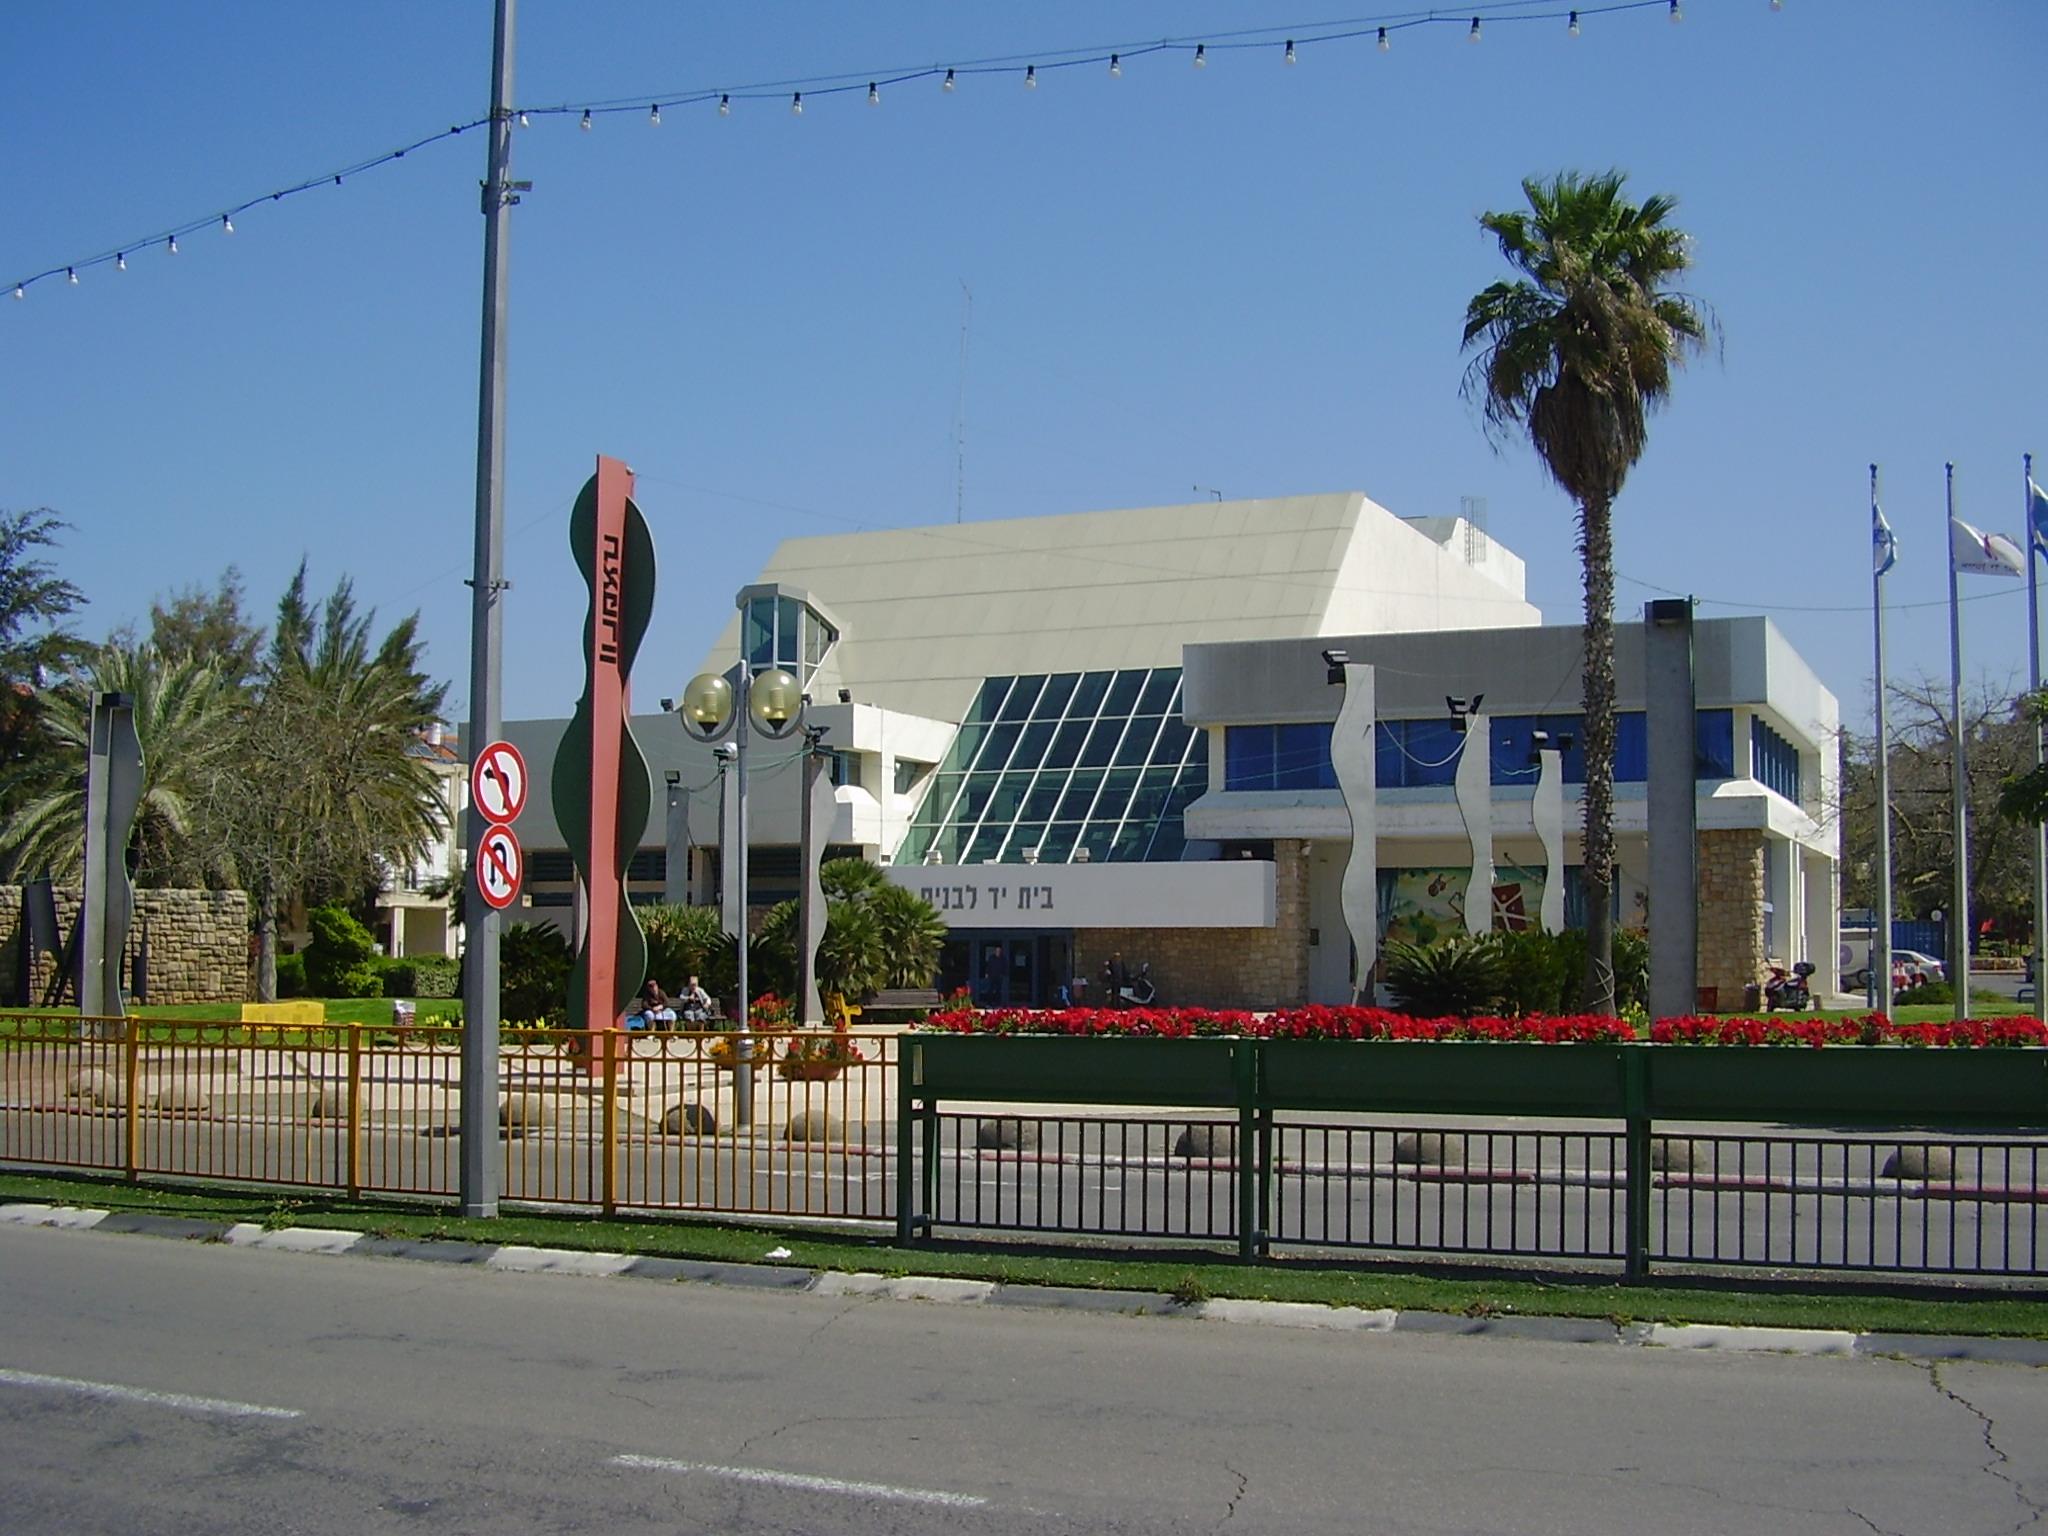 File:PikiWiki Israel 12346 yad labanim holon.jpg - Wikimedia Commons